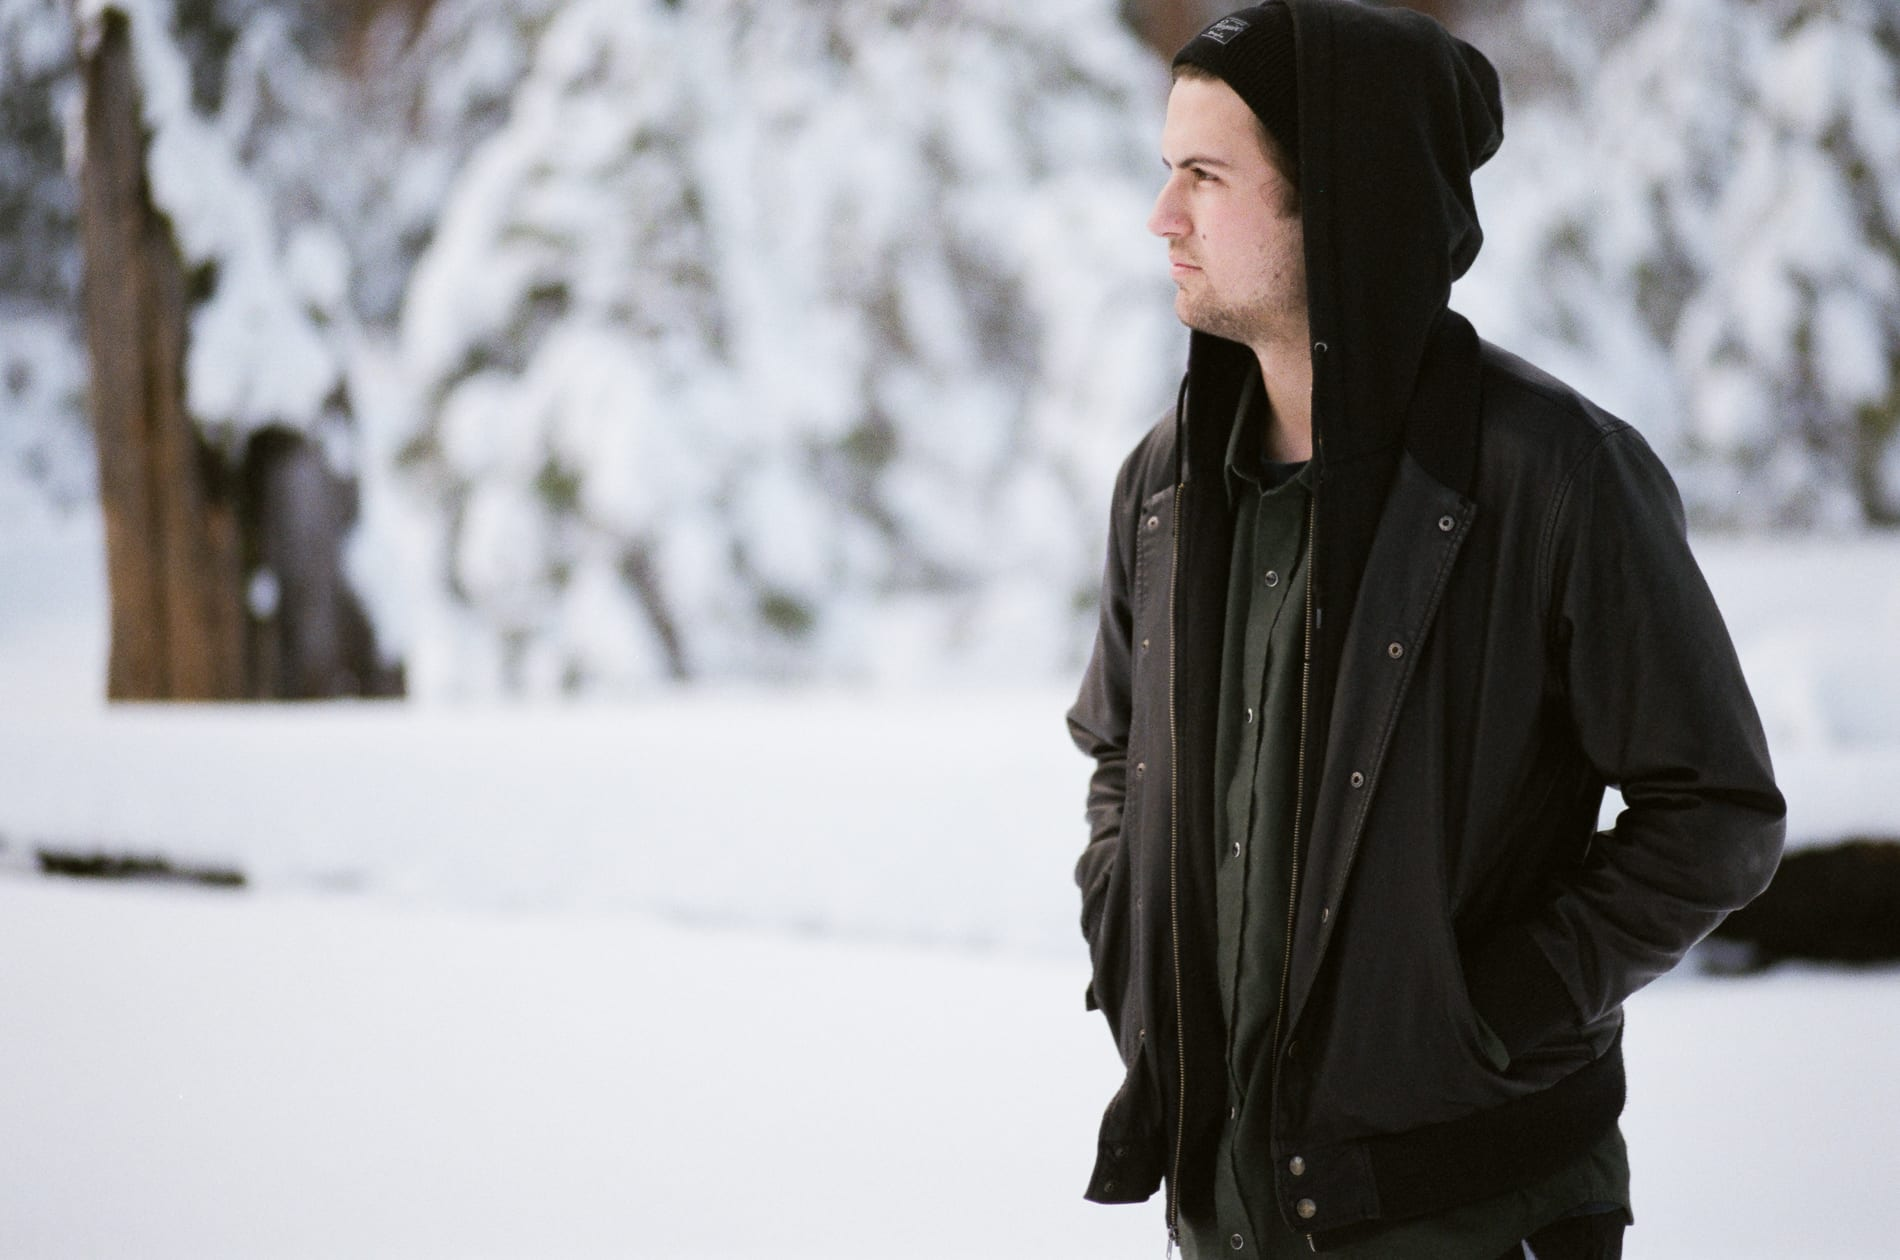 mt-lassen-winter-snow-couples-photo-16